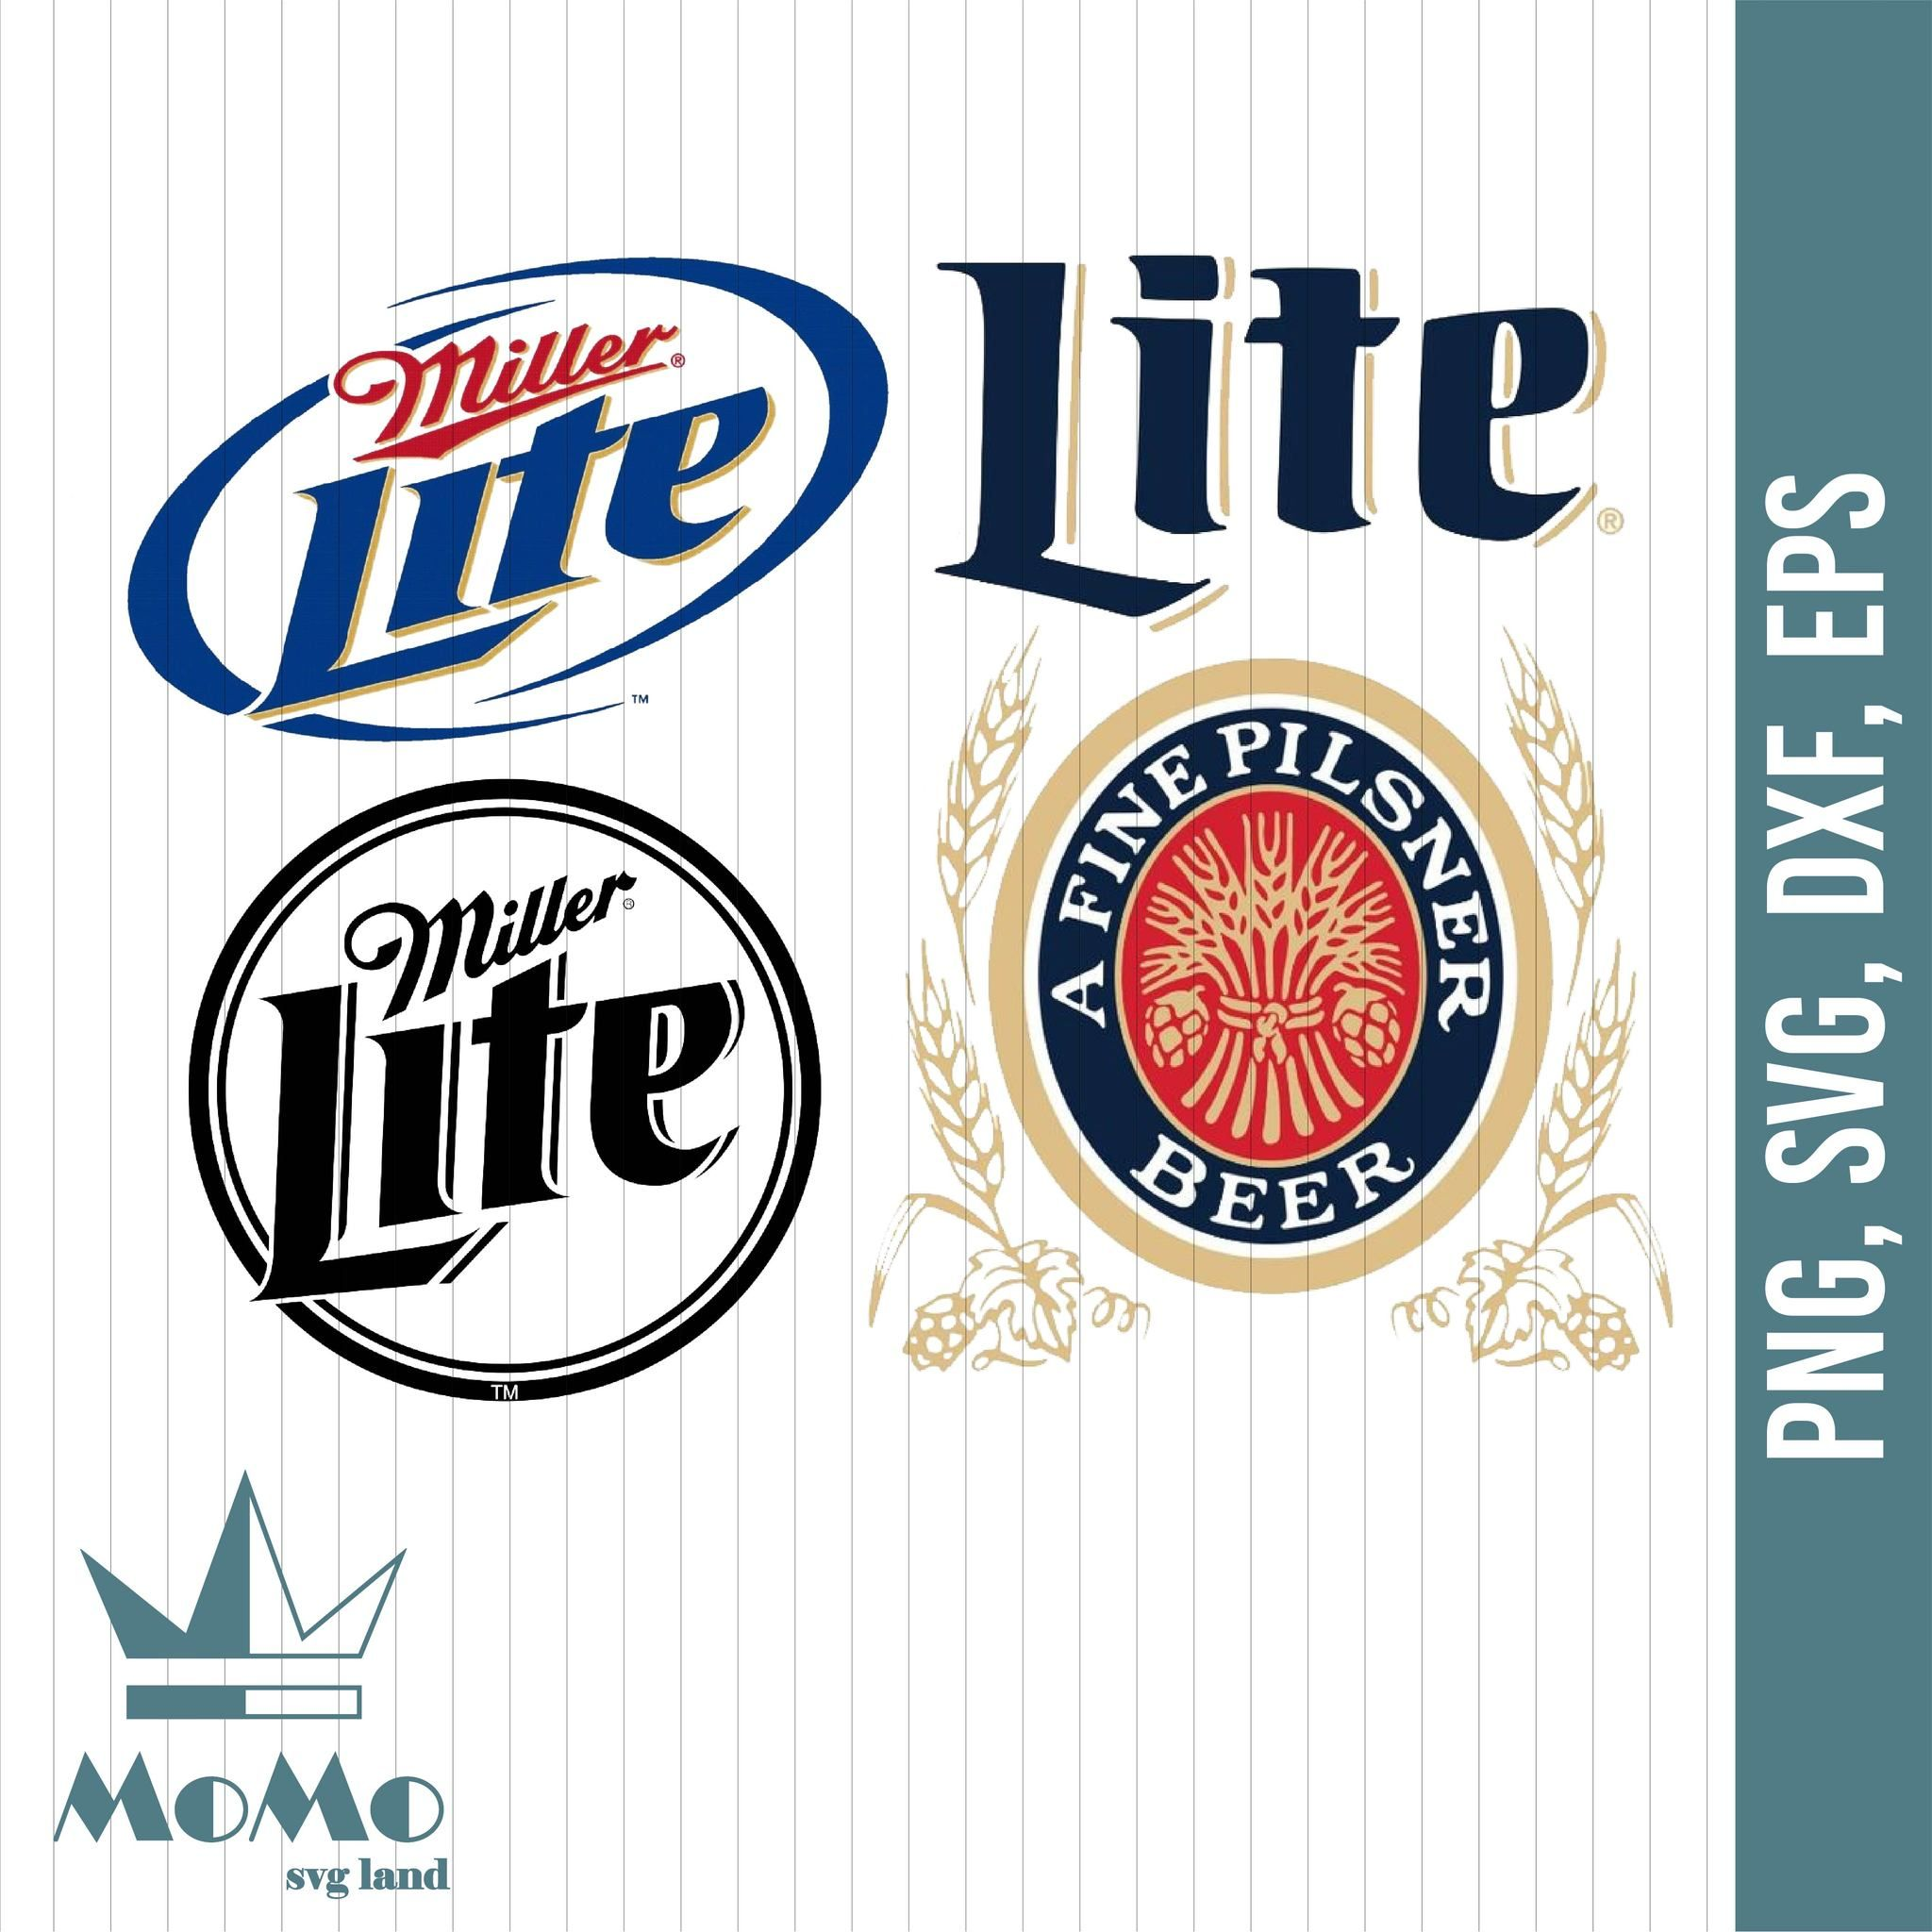 Miller Lite Miller Brewing Company Beer Pale Lager Beer Beer Miller Lite Low Calorie Beer